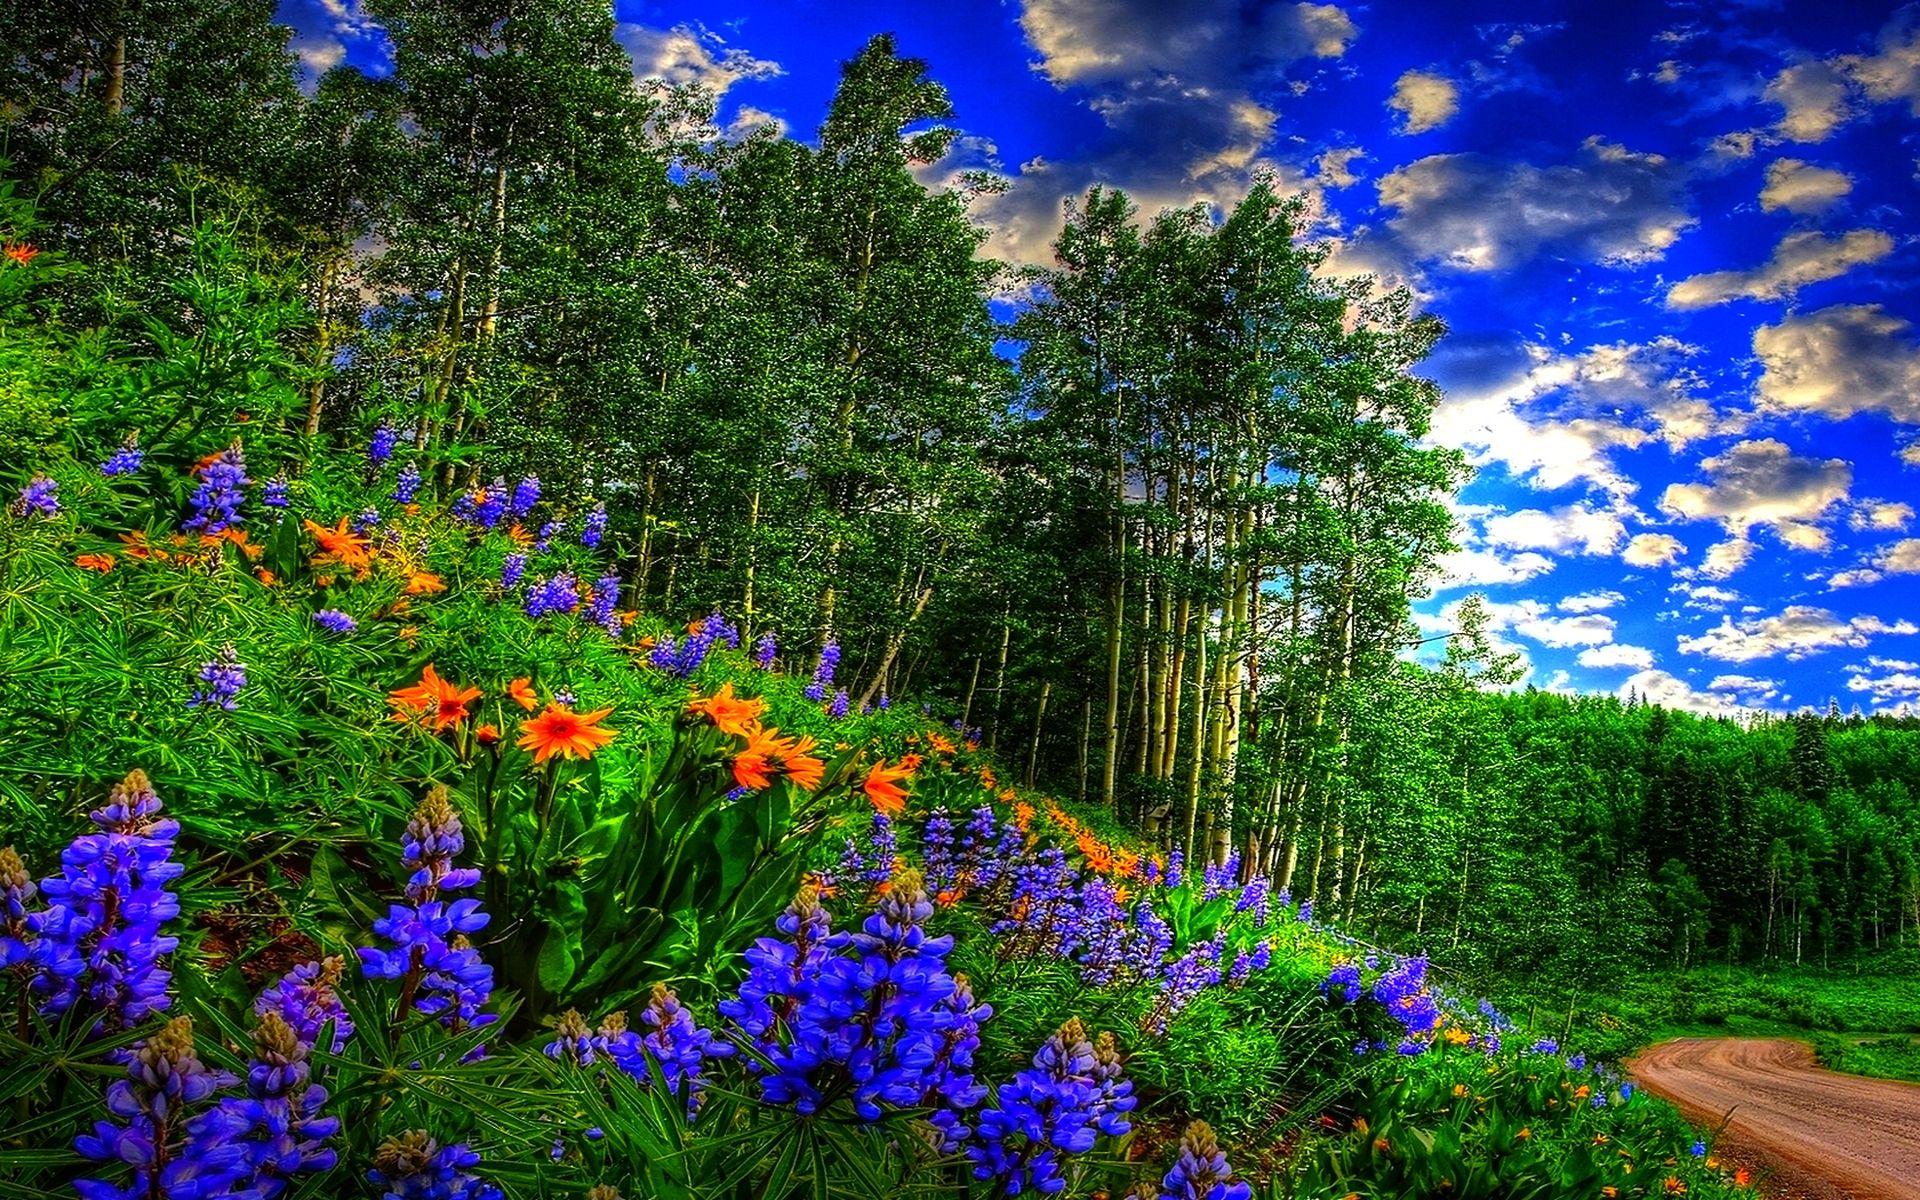 Free Desktop Wallpapers Spring Scenes Wallpaper Hintergrundbilder Hintergrundbilder Natur Schone Natur